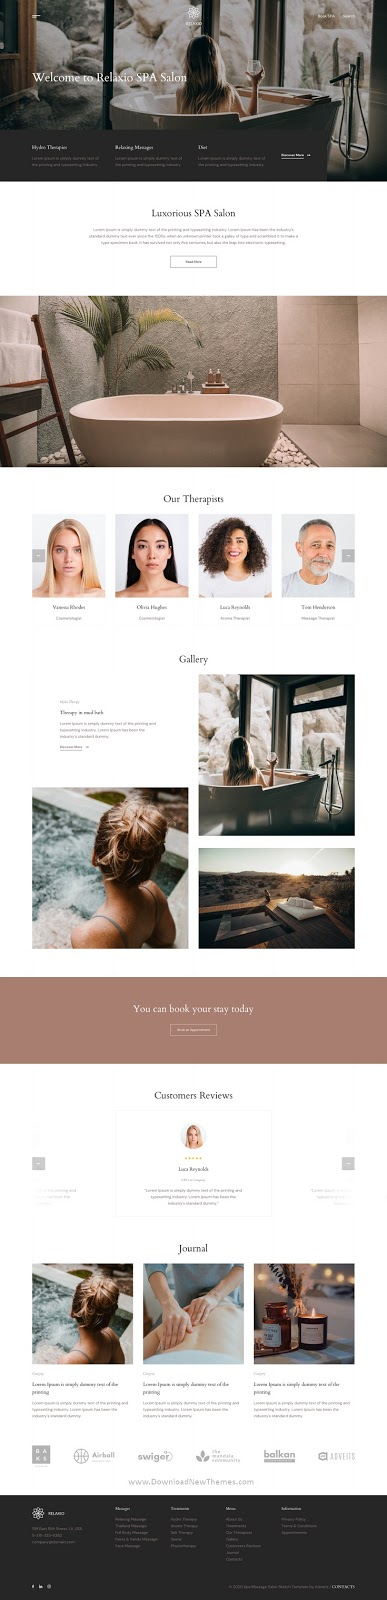 Spa Massage Salon Adobe XD Template